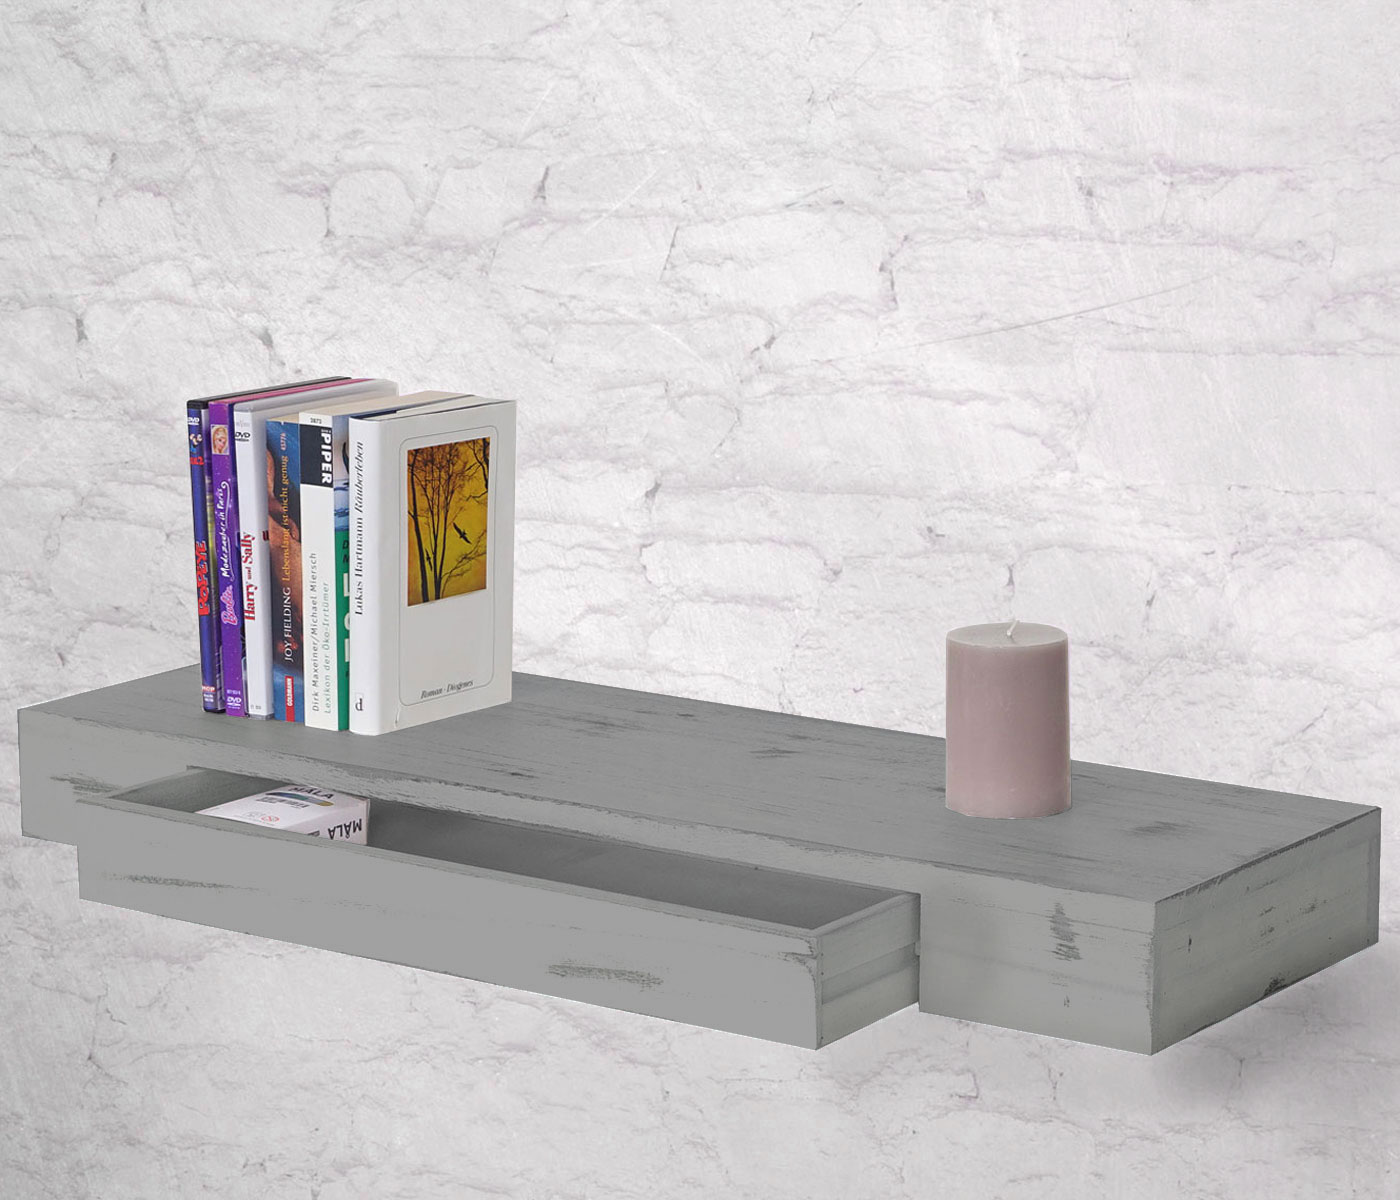 shabby wandregal oise 80cm schublade grau. Black Bedroom Furniture Sets. Home Design Ideas